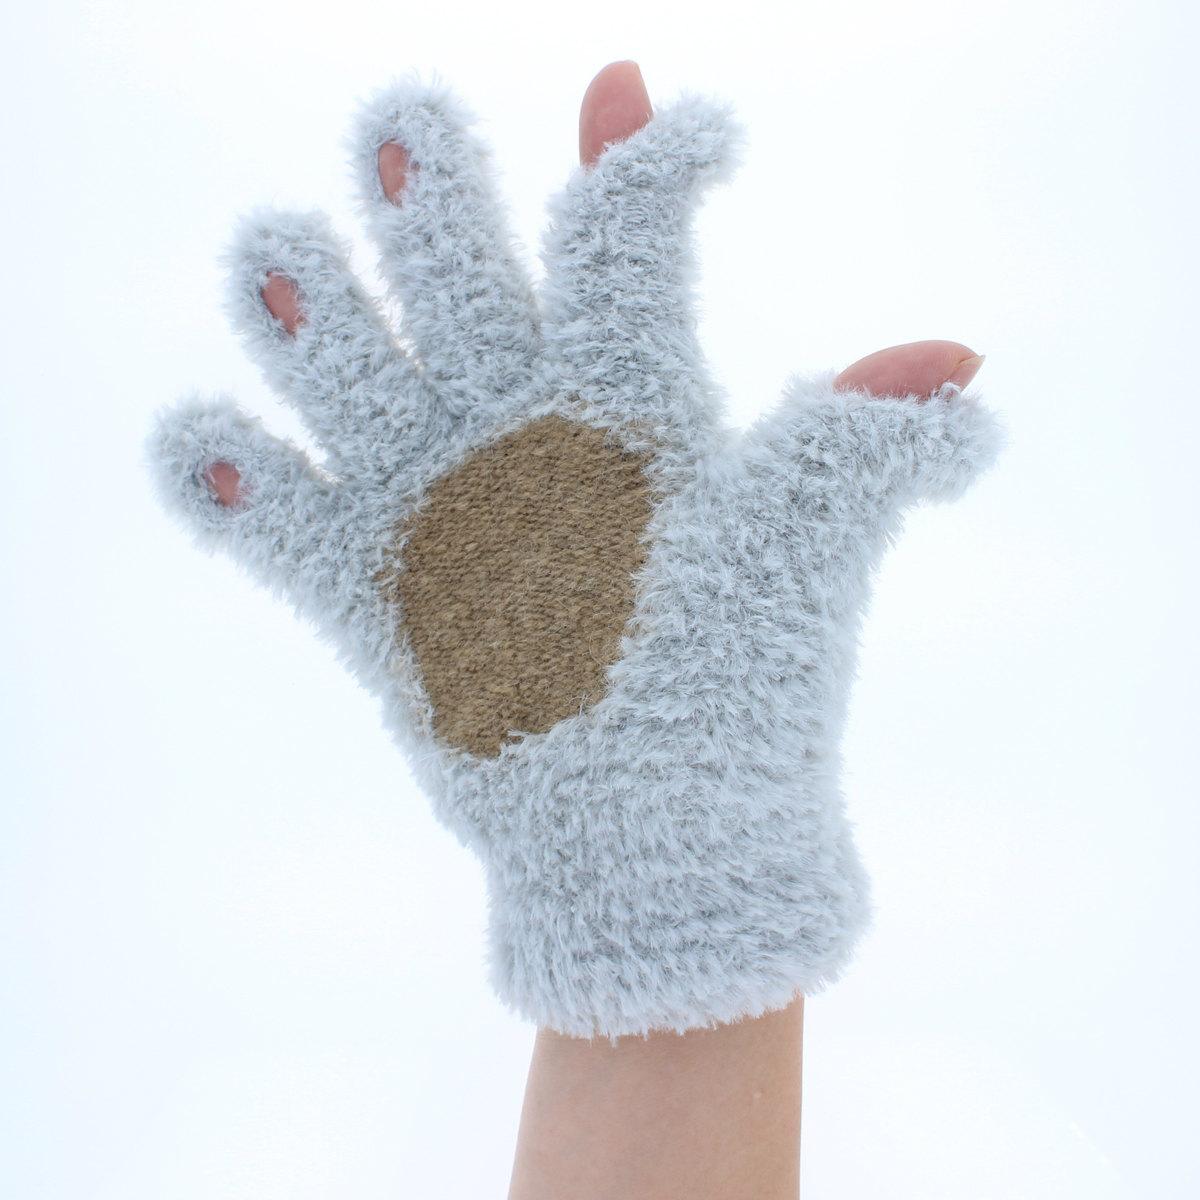 YUBIDERU ユビデル 指先が出る 指紋認証ラクラク アニマル手袋 レディース ティーンズ ニット手袋 ハリネズミ柄